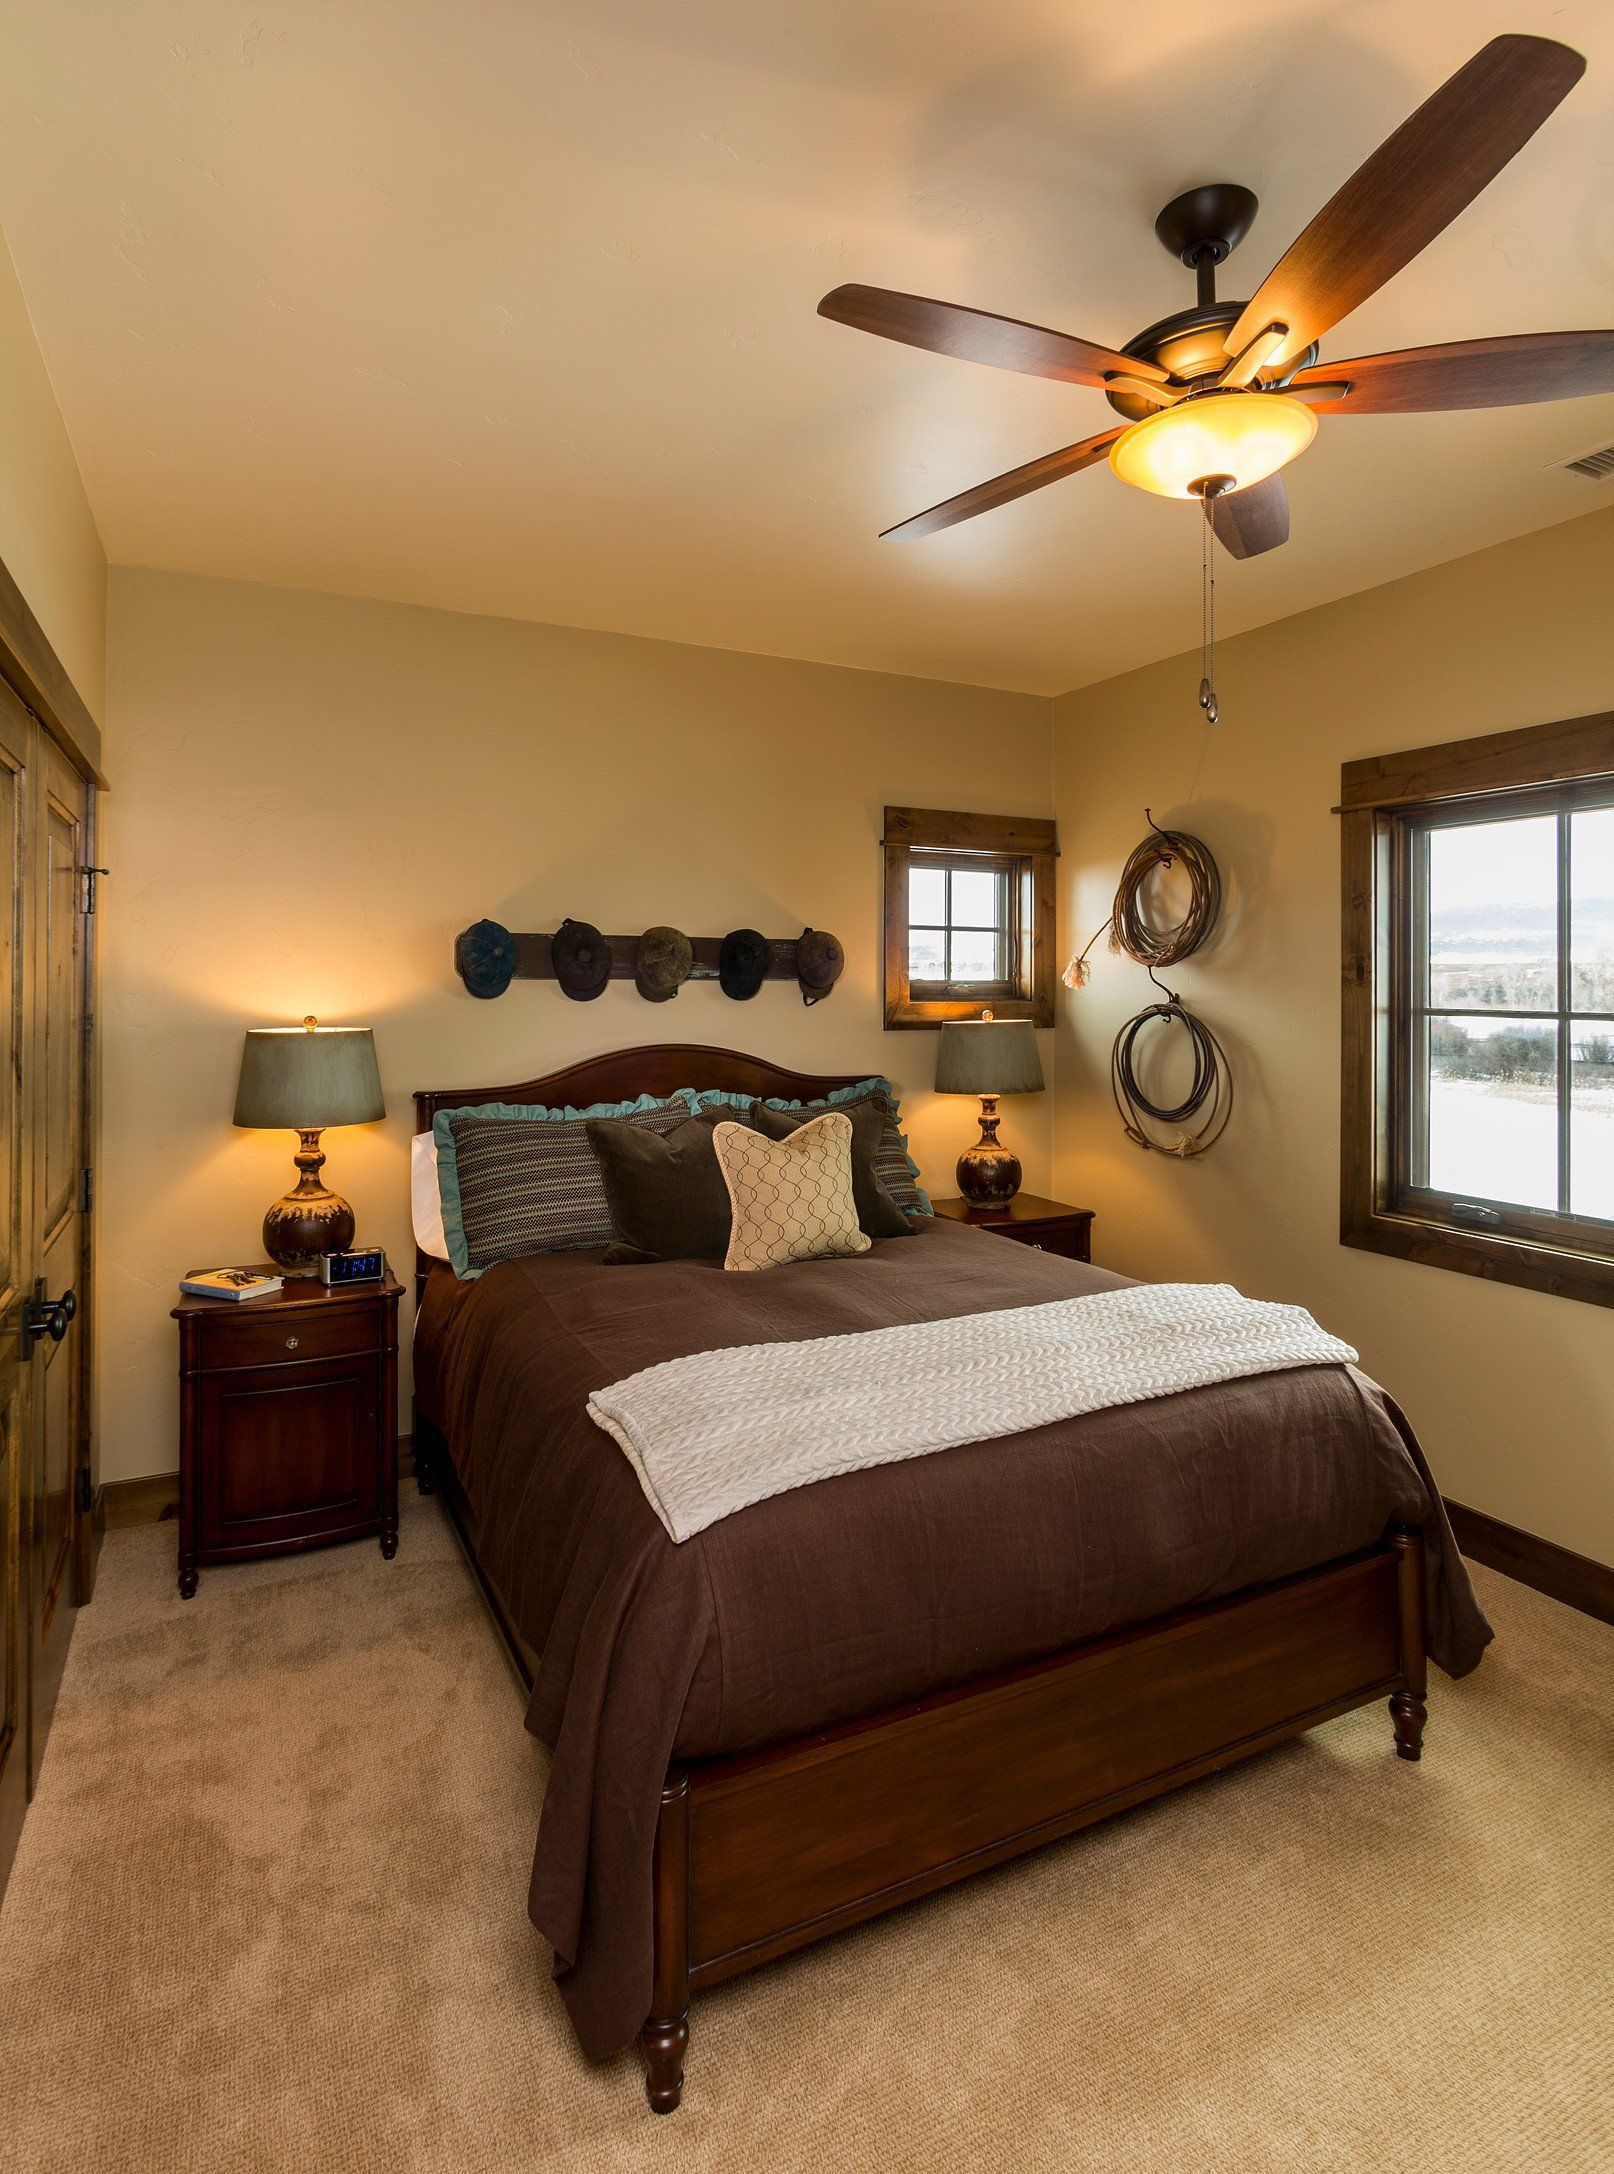 Olivia's Home Furnishings & Interior Design | Home ...